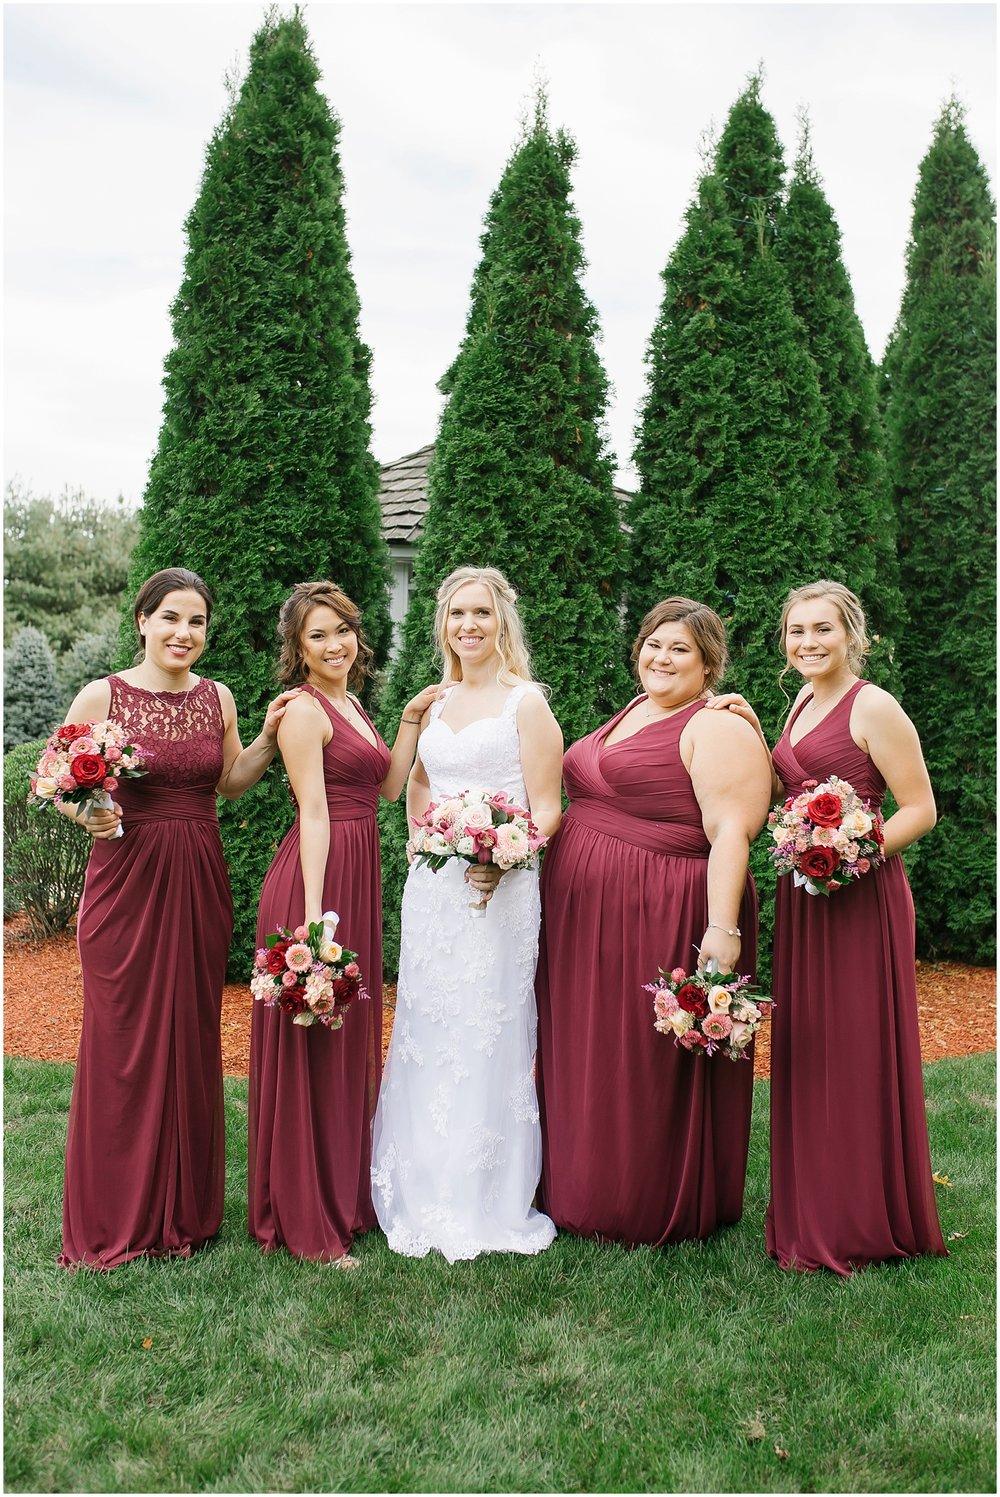 connecticut wedding photographers | Lauryn Alisa Photography | www.laurynalisaphotography.com